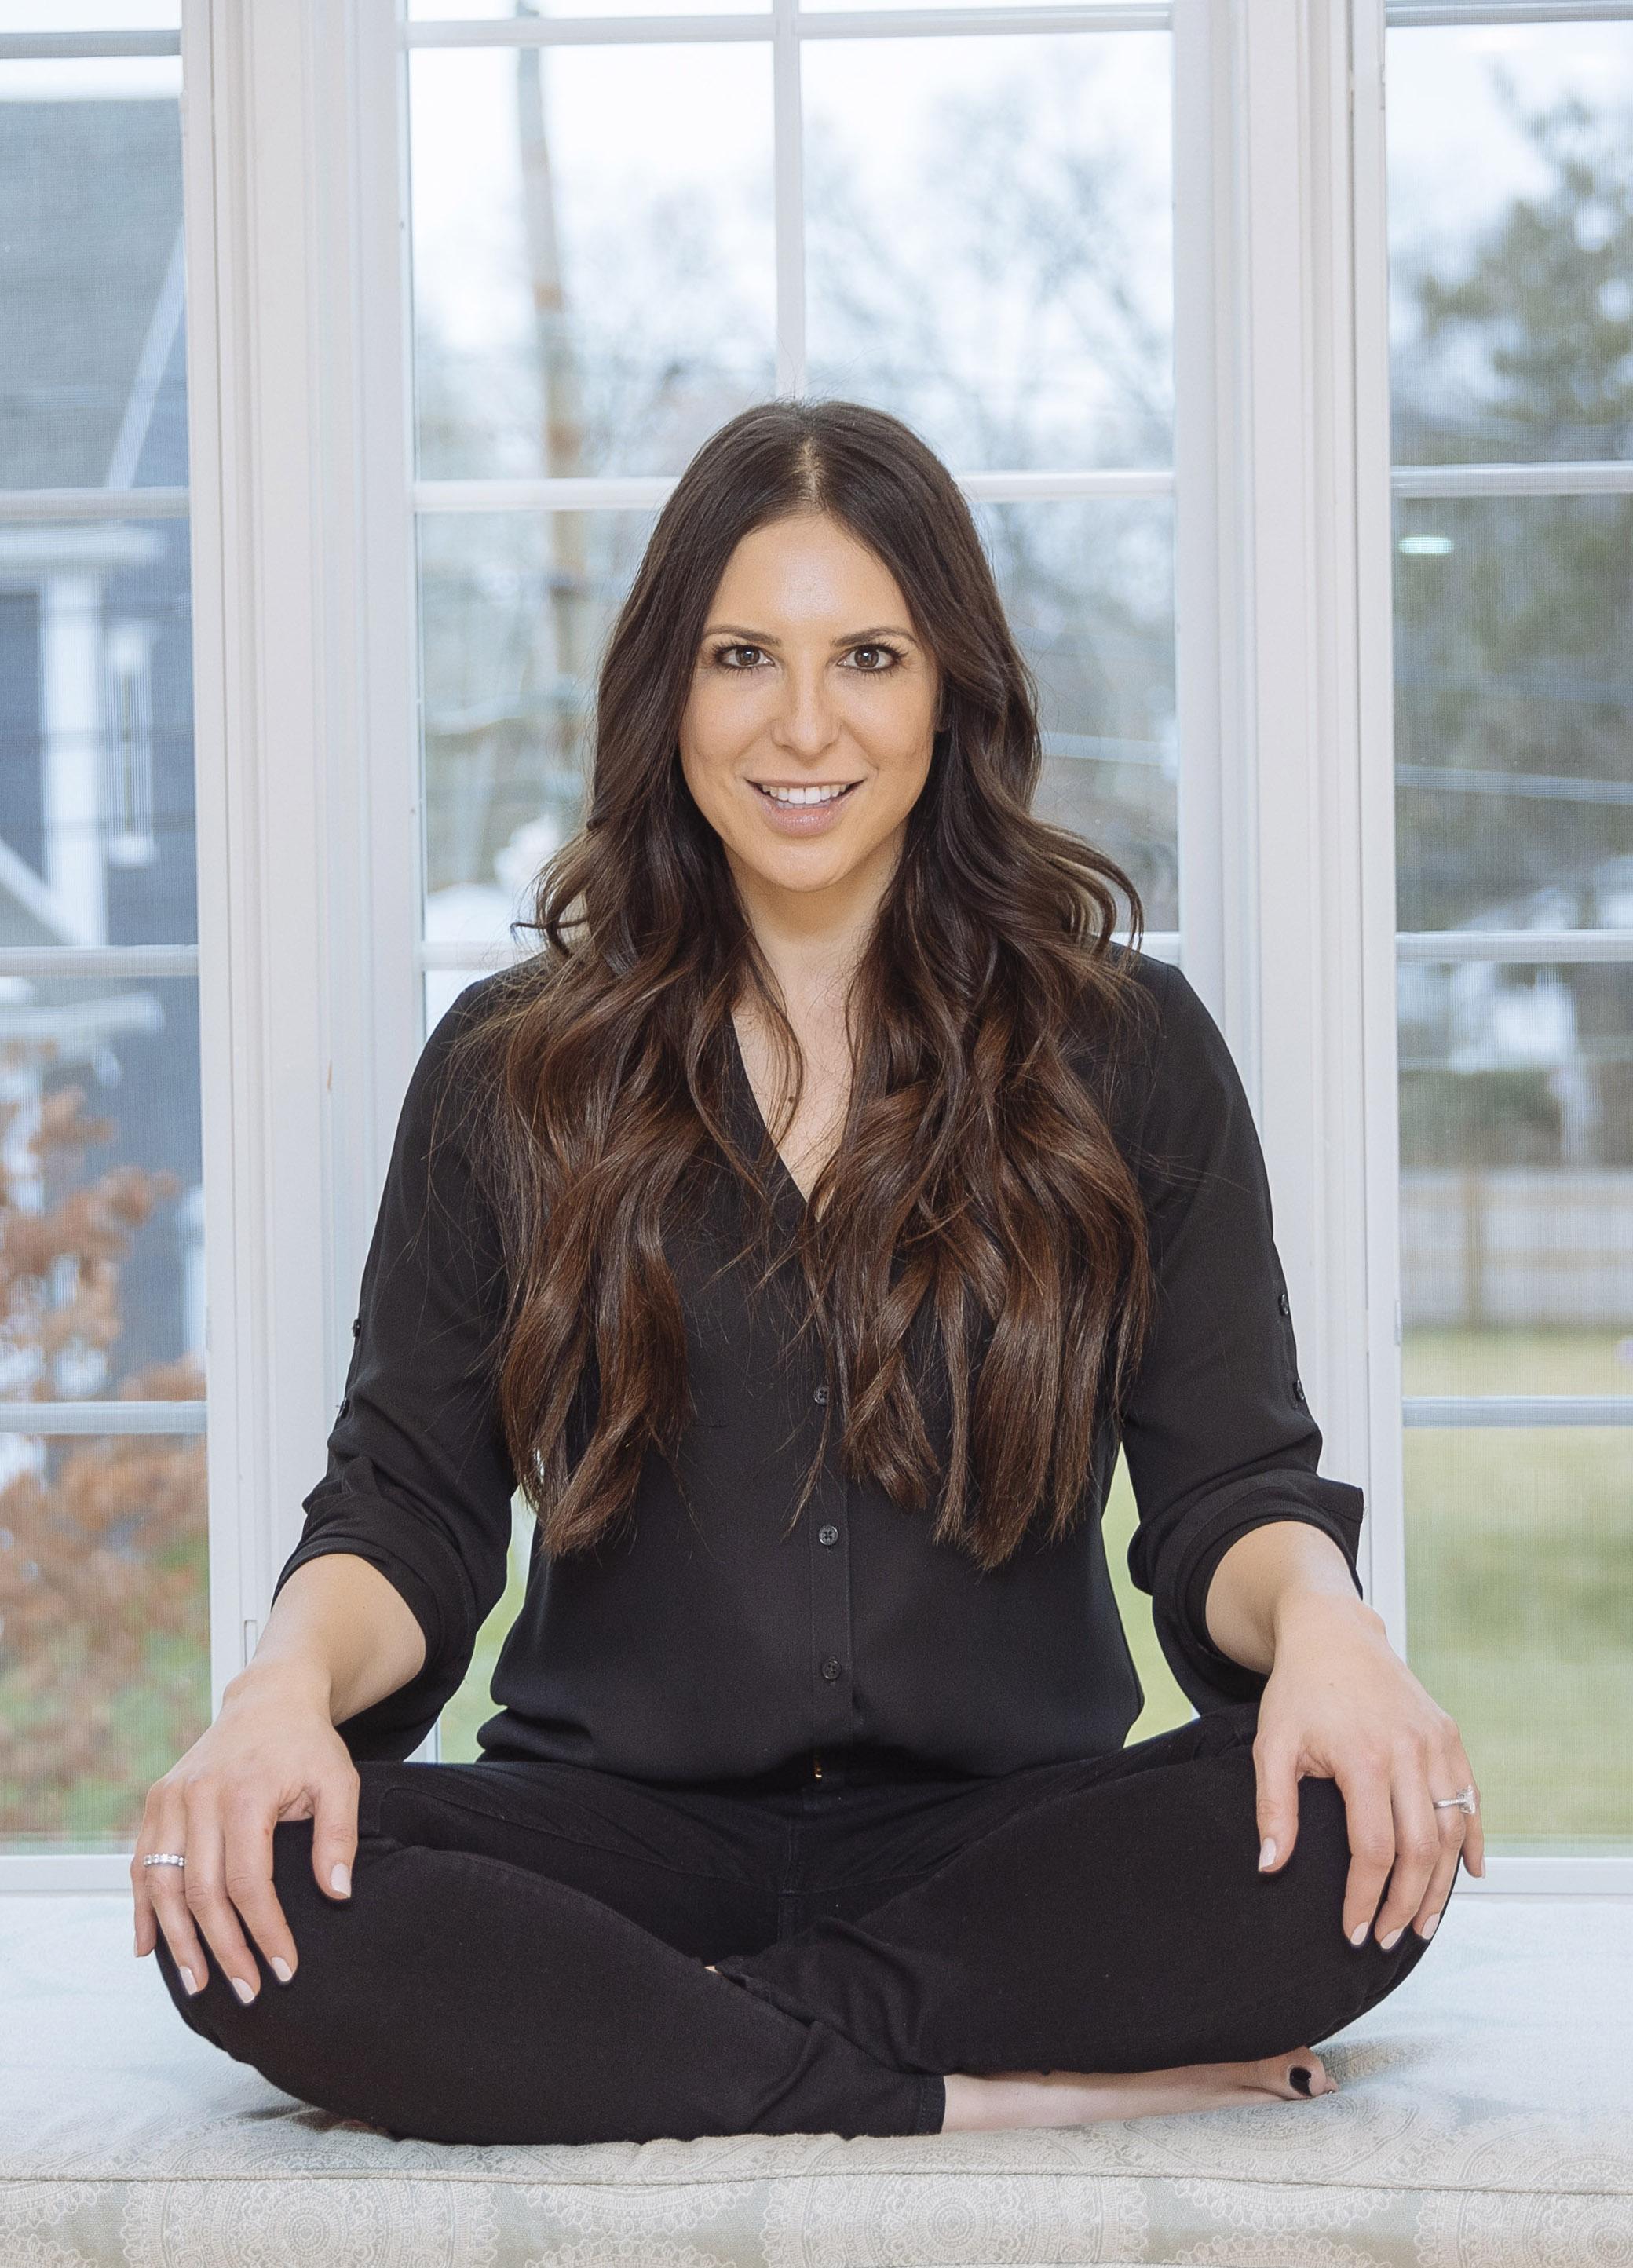 Corinne Morahan - Grid and Glam